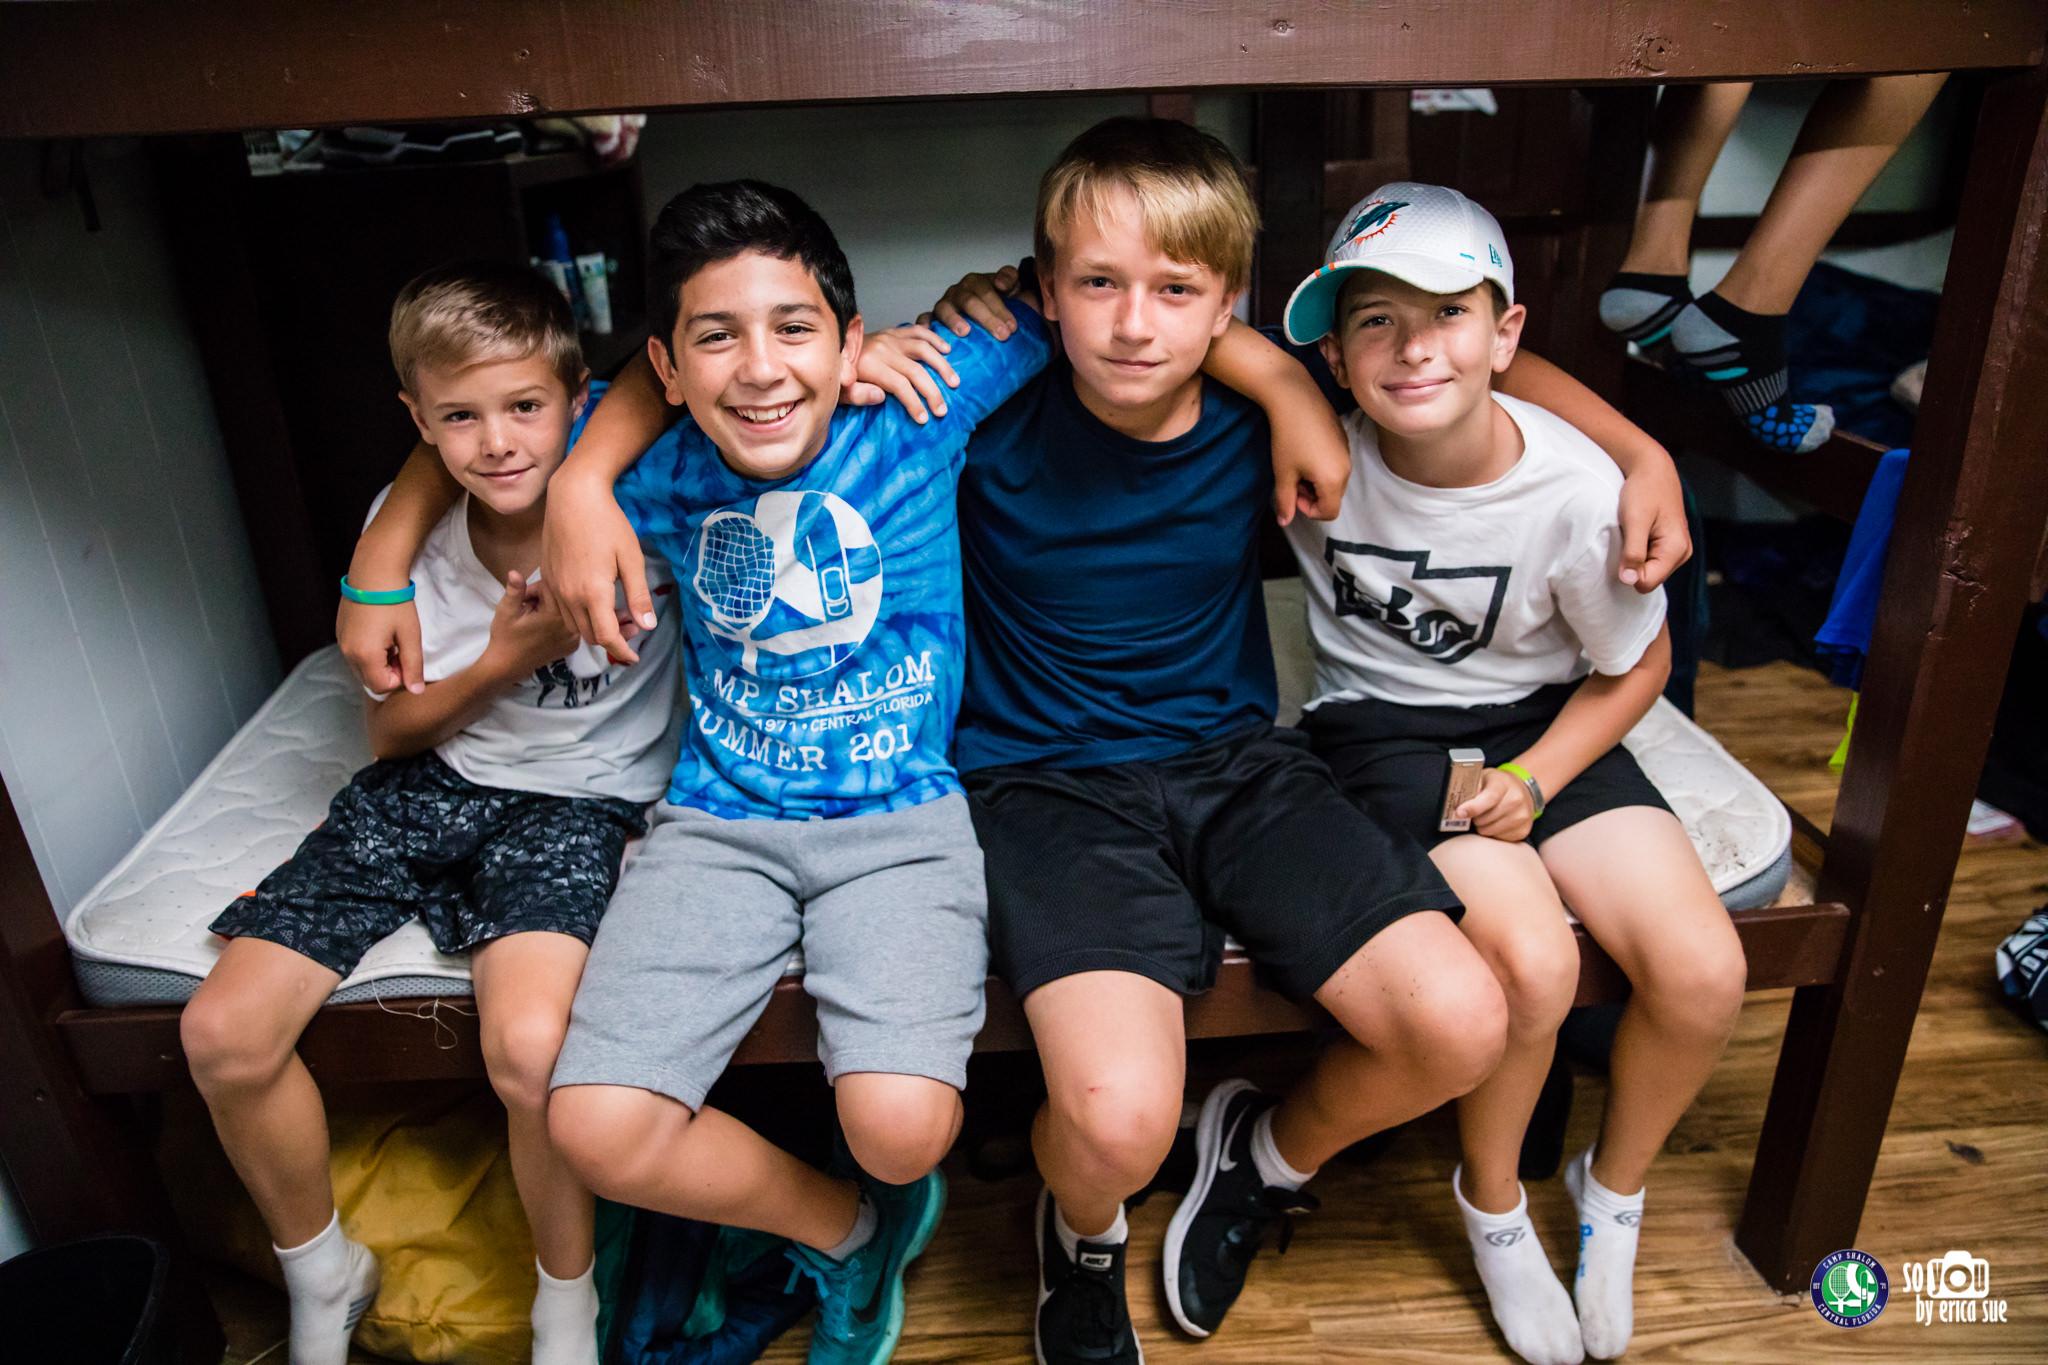 so-you-by-erica-sue-camp-shalom-central-florida-sleepaway-camp-4771.jpg